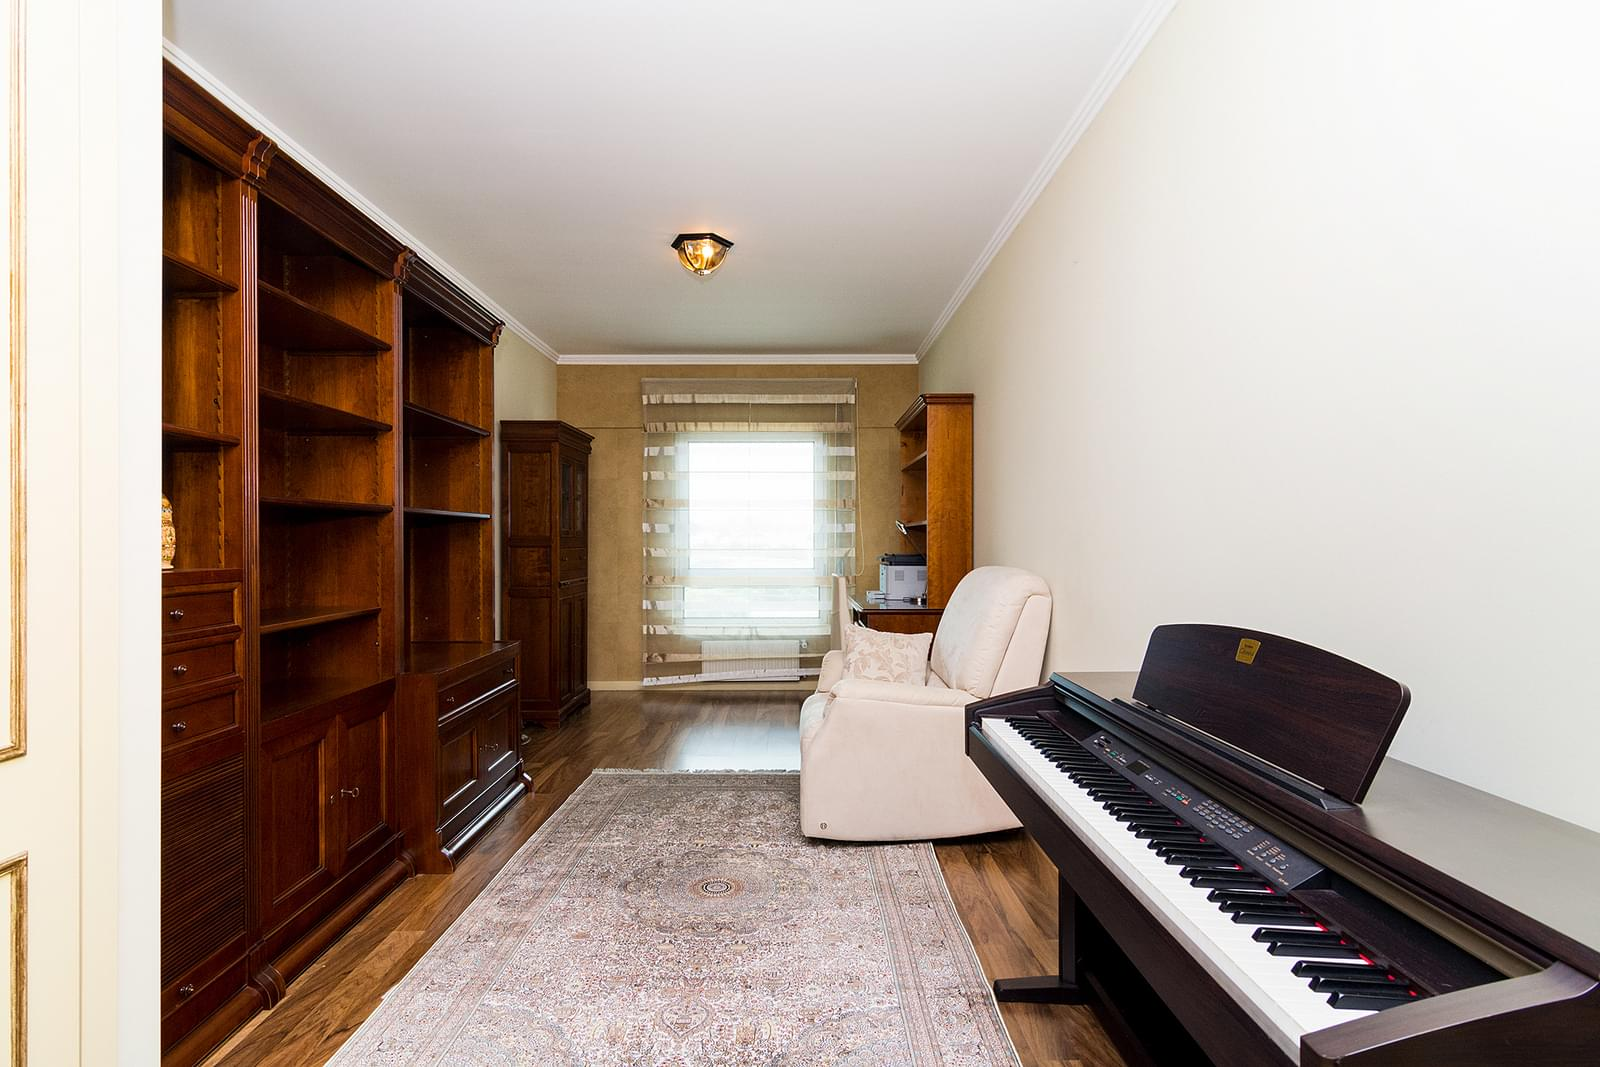 pf17449-apartamento-t4-lisboa-4ad7dd3e-70a1-464e-9522-9c03b4471c6a